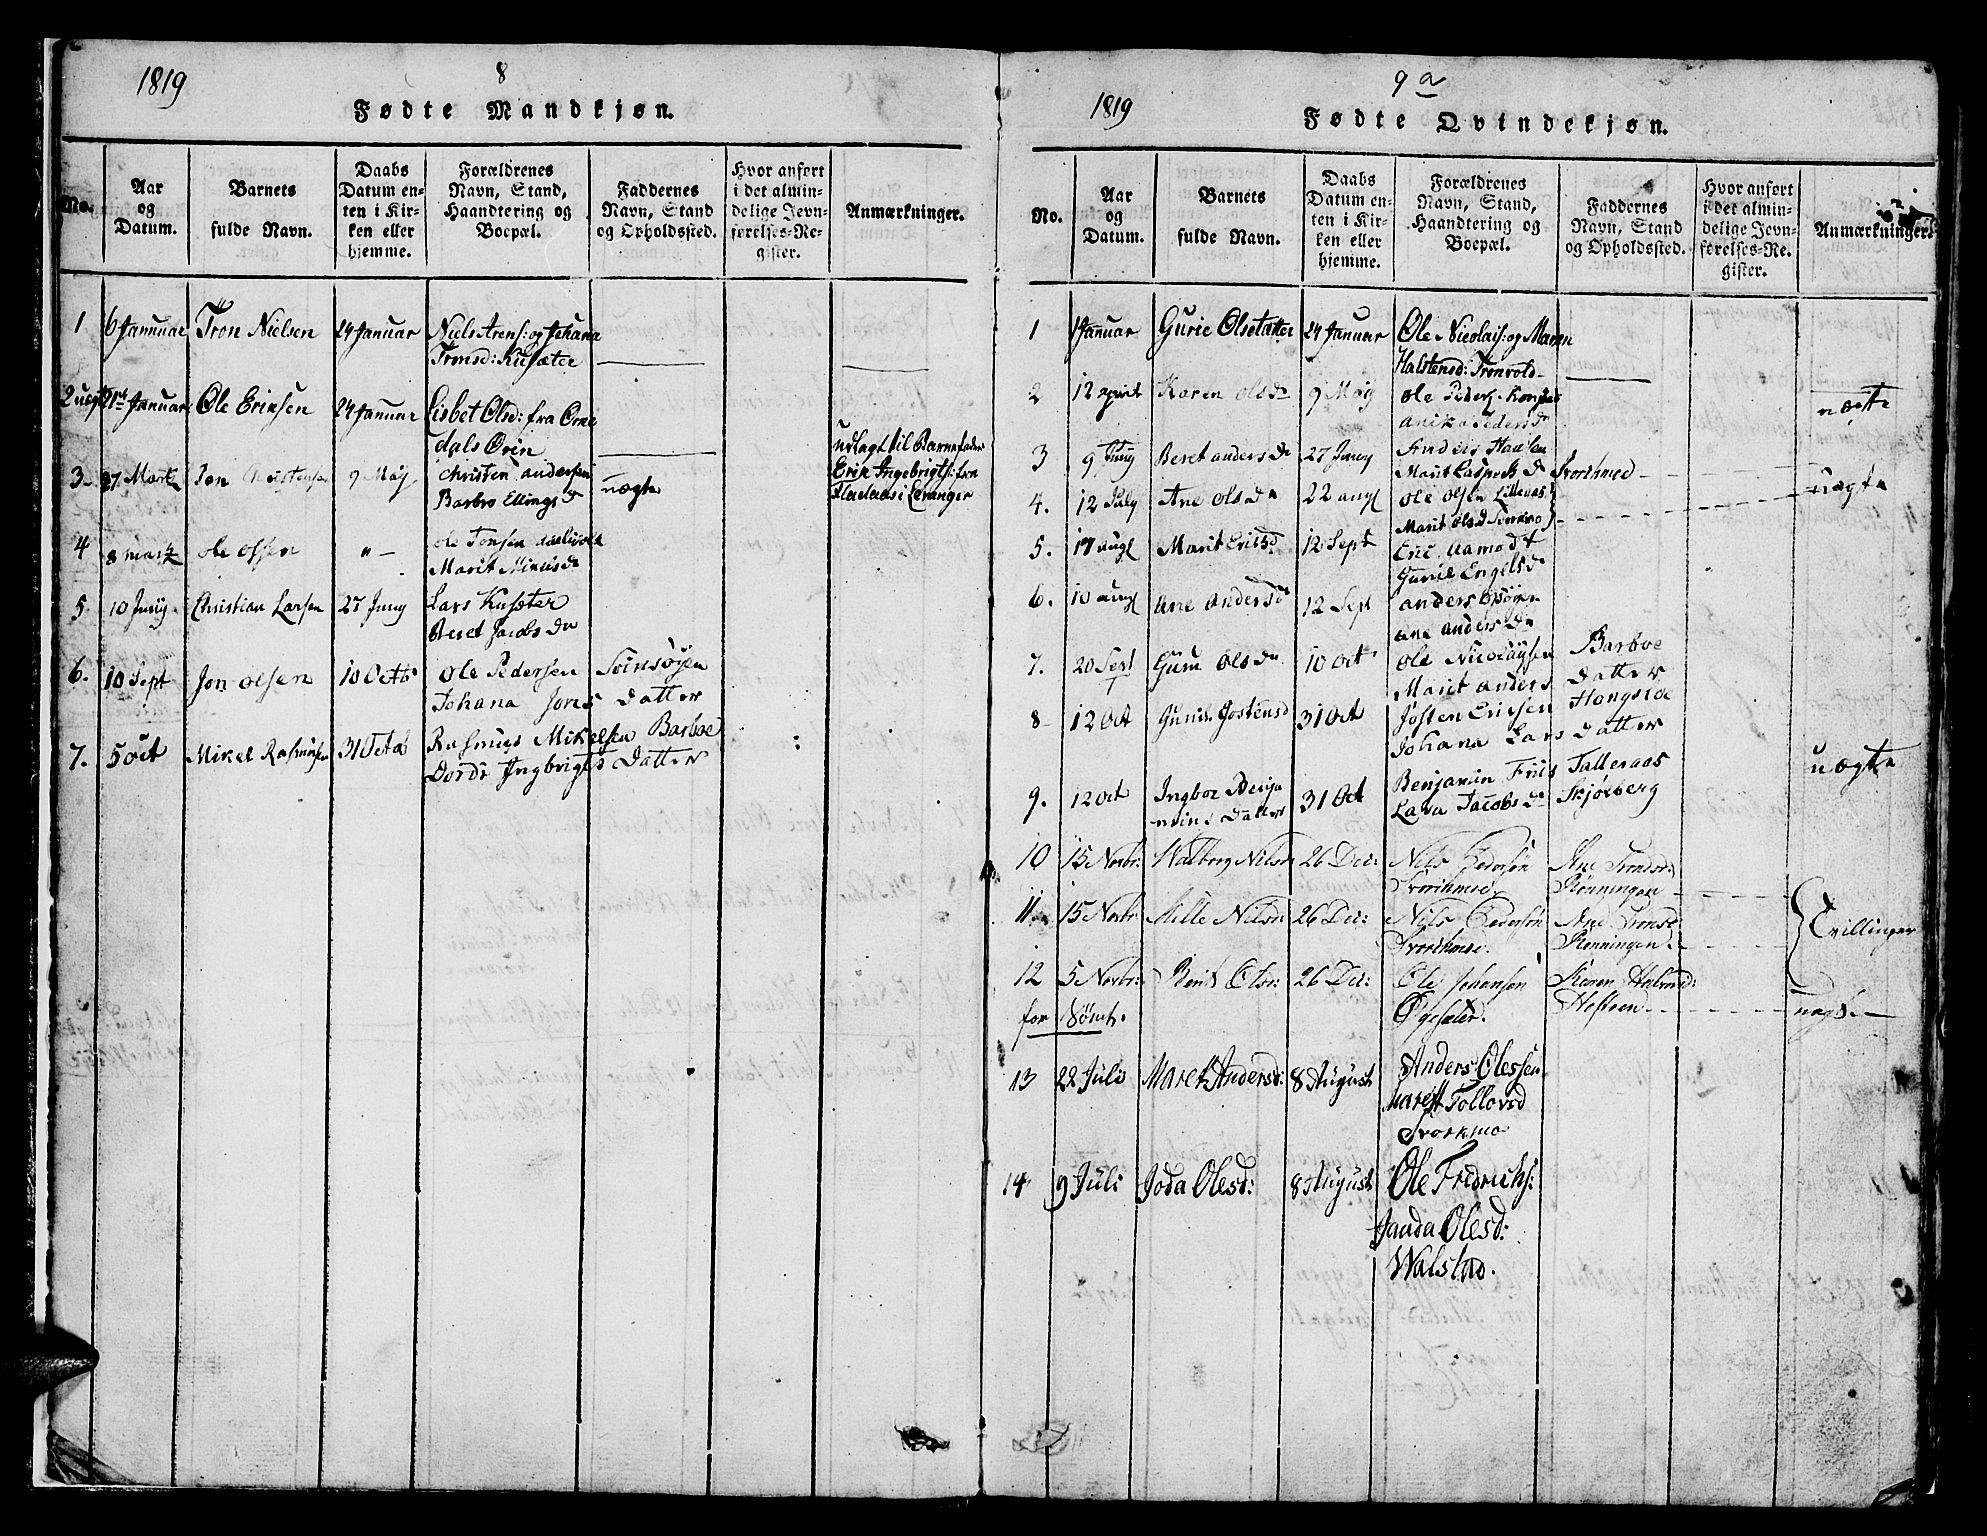 SAT, Ministerialprotokoller, klokkerbøker og fødselsregistre - Sør-Trøndelag, 671/L0842: Klokkerbok nr. 671C01, 1816-1867, s. 8a-9a